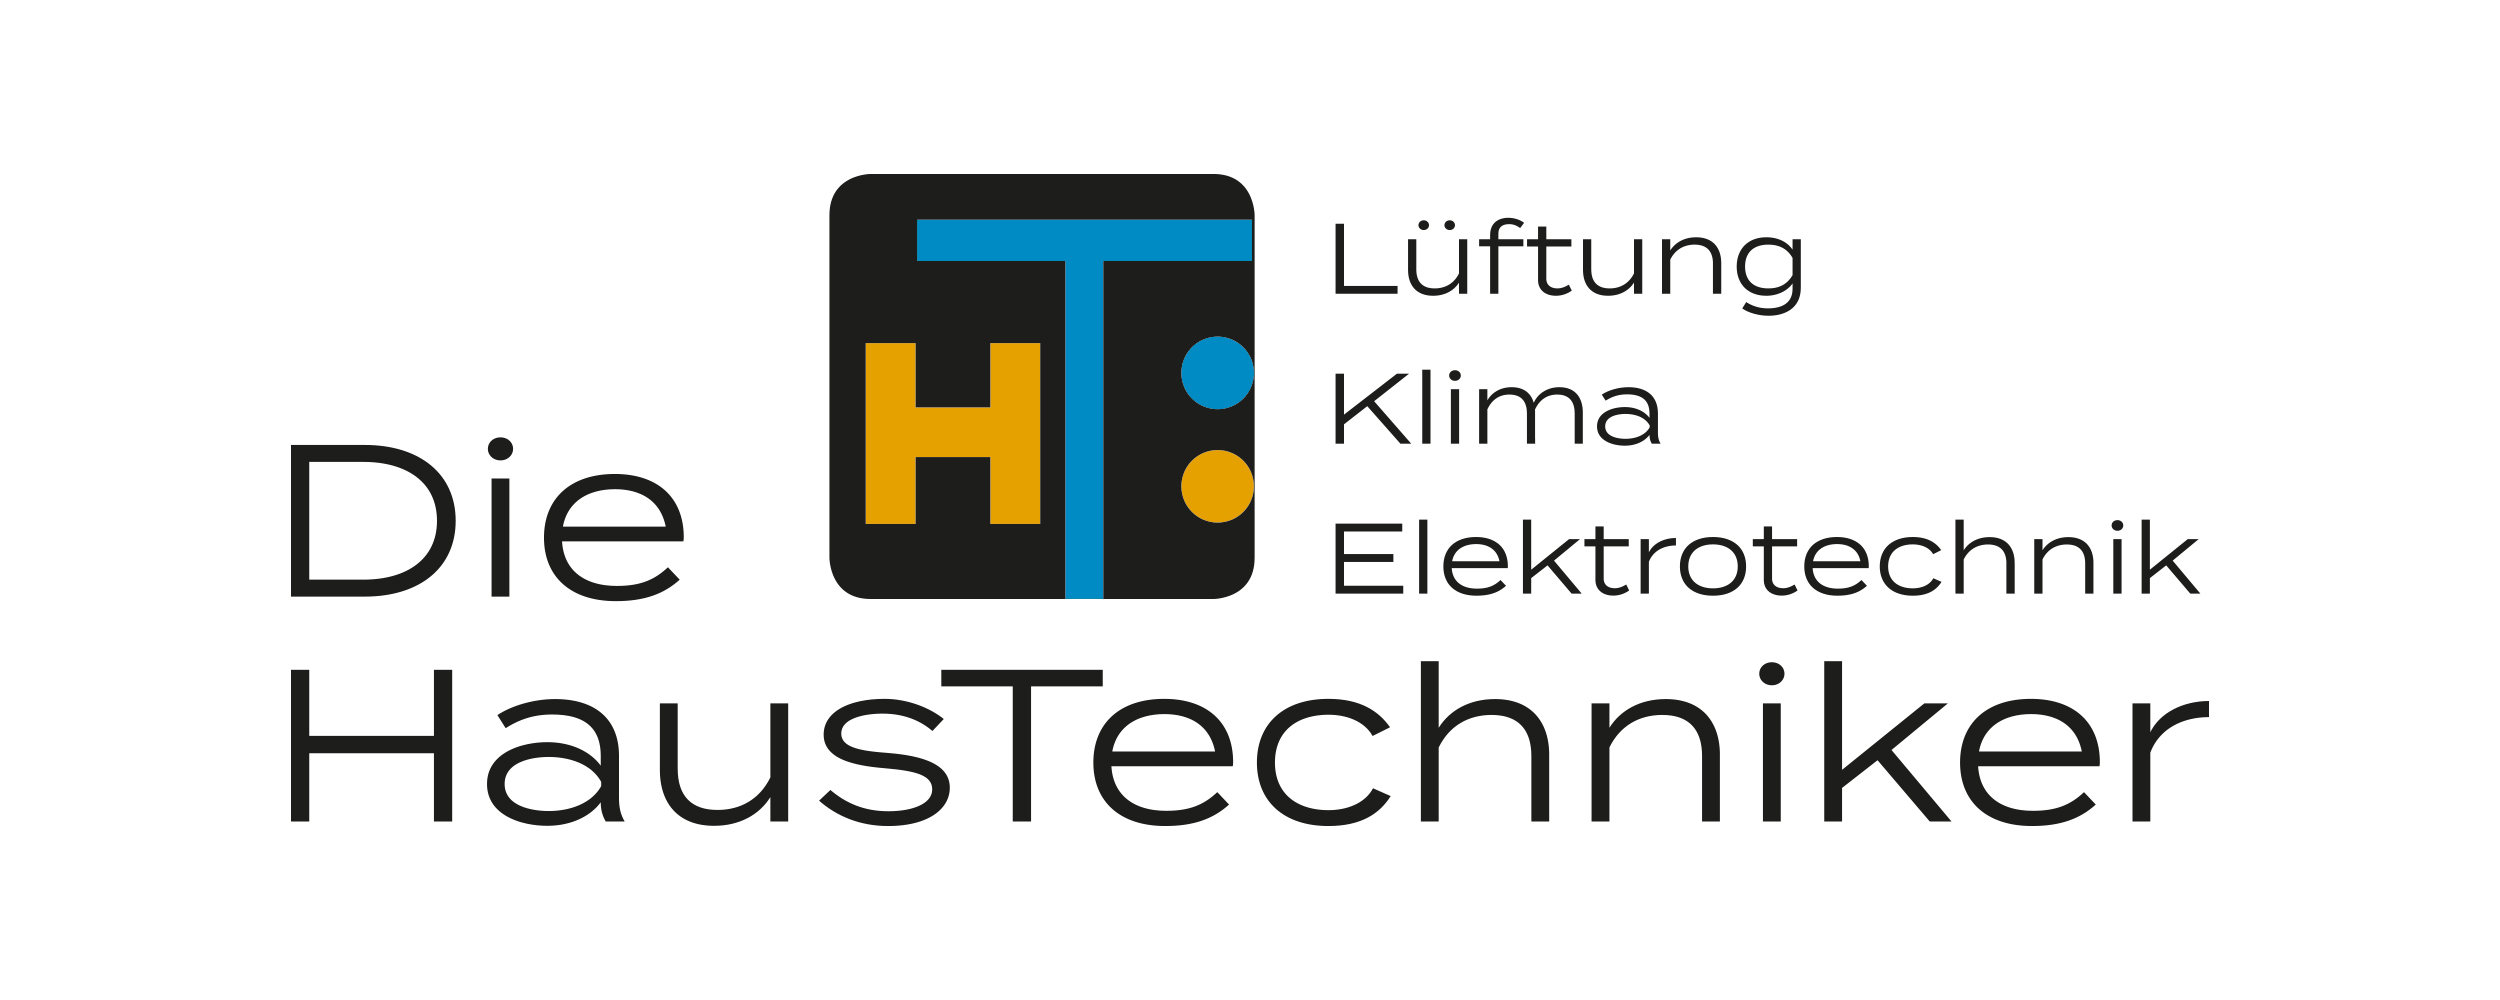 Logo Die Haustechniker GmbH Leonberg Lüftung Klima Elektrotechnik